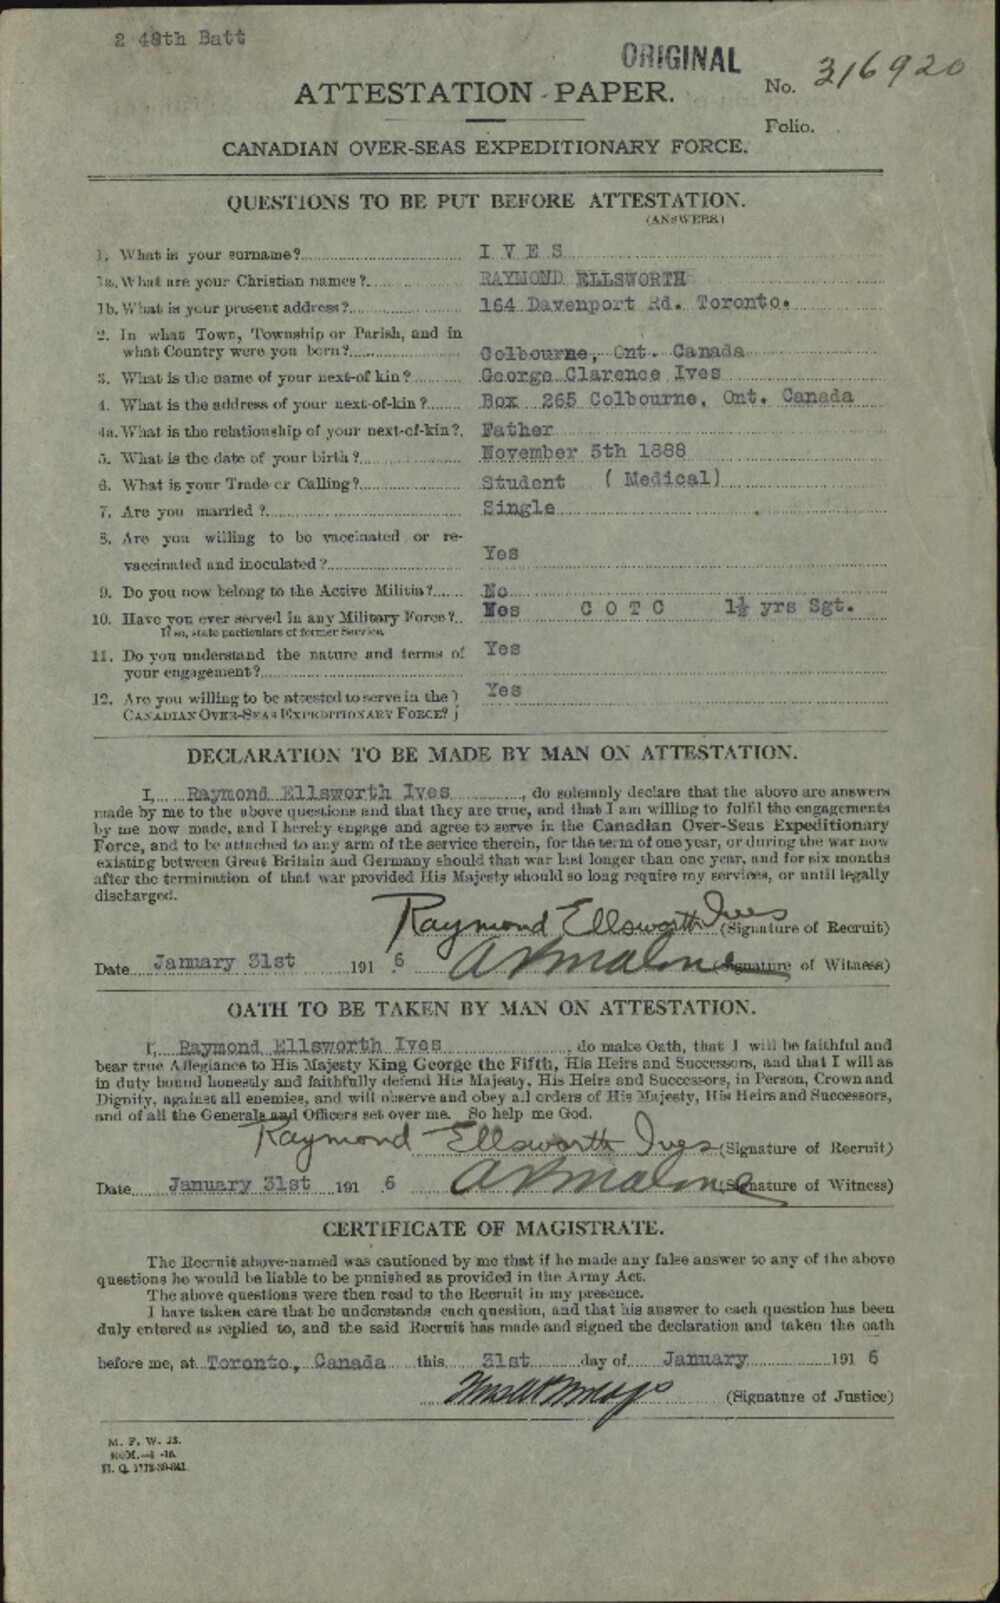 Raymond Ellsworth Ives, Service Files, WWI, Cramahe Township